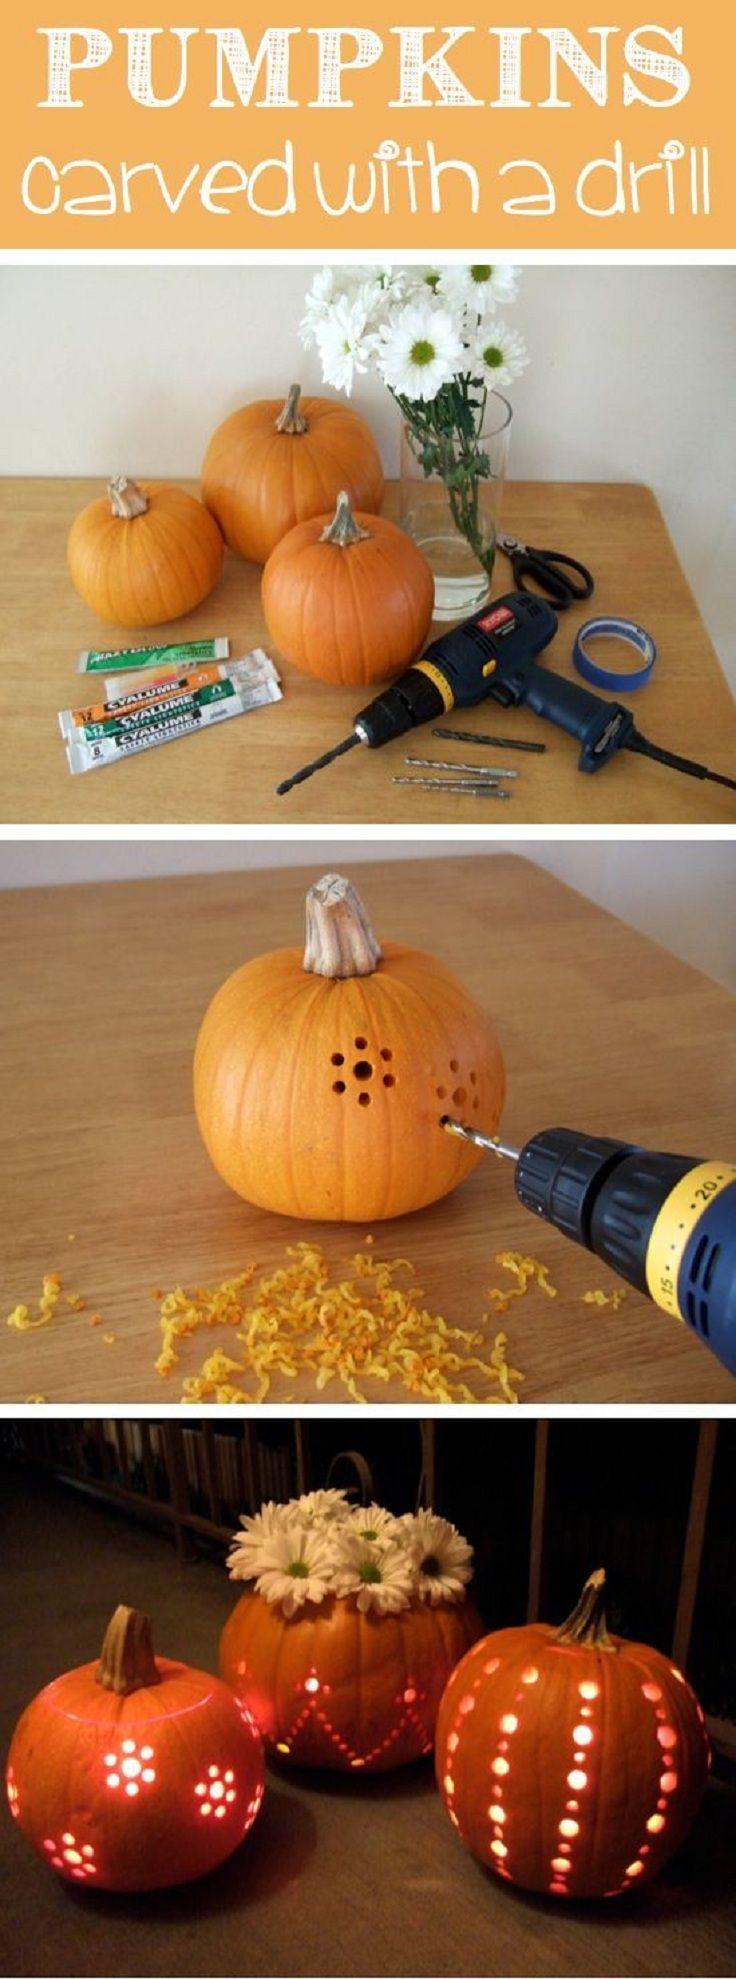 10. Halloween Pumpkins